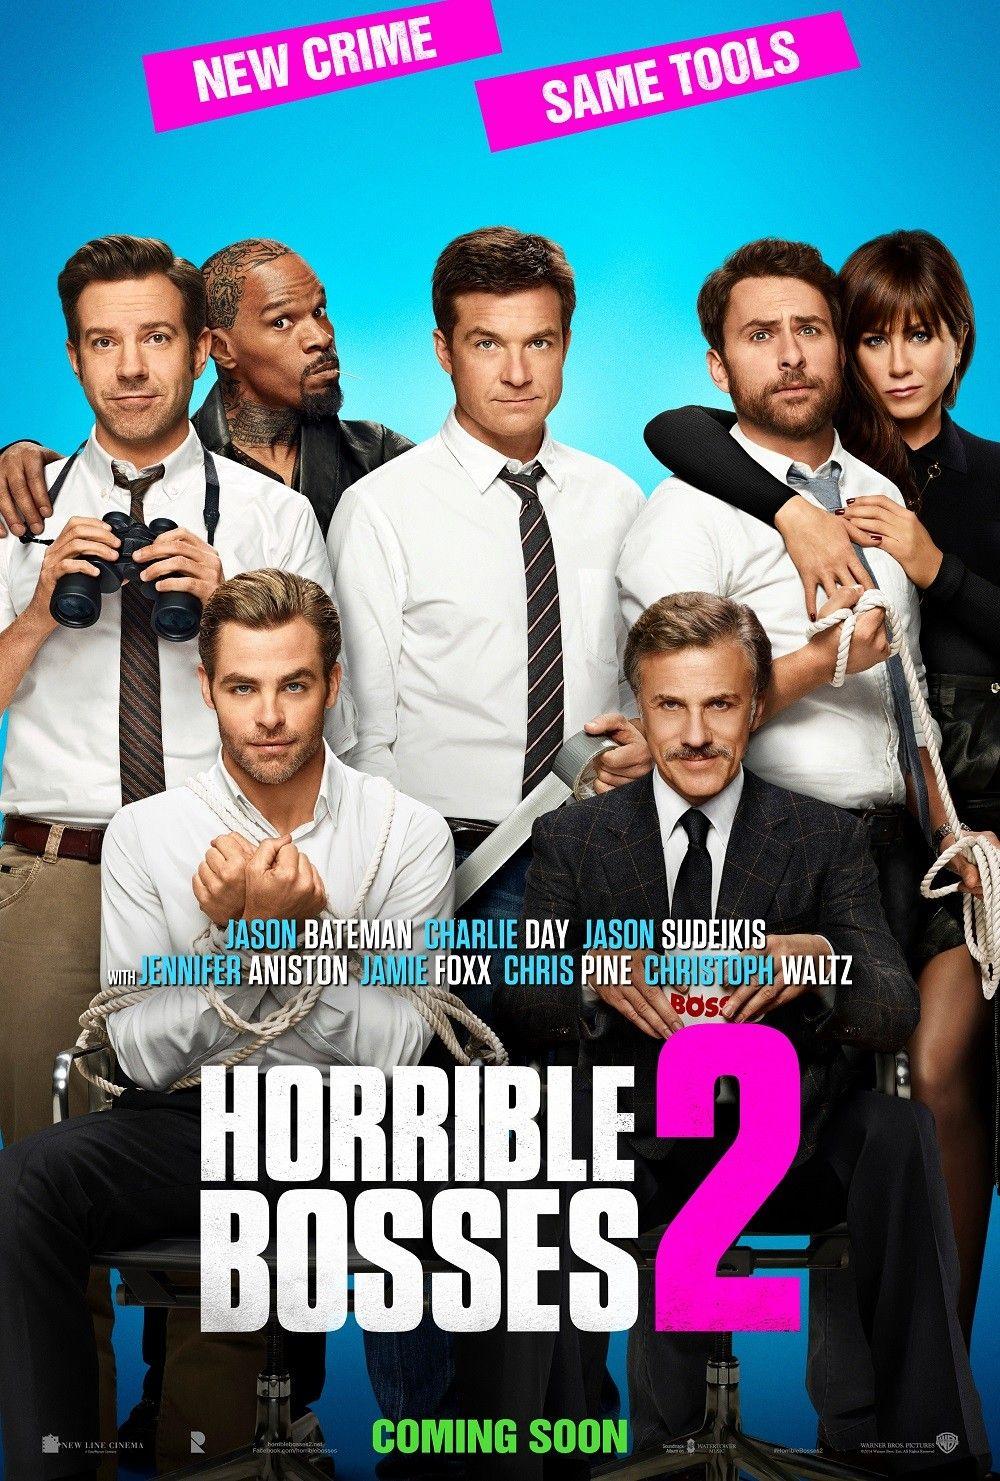 Horrible Bosses 2 2014 Horrible Bosses Movie Horrible Bosses Comedy Movies